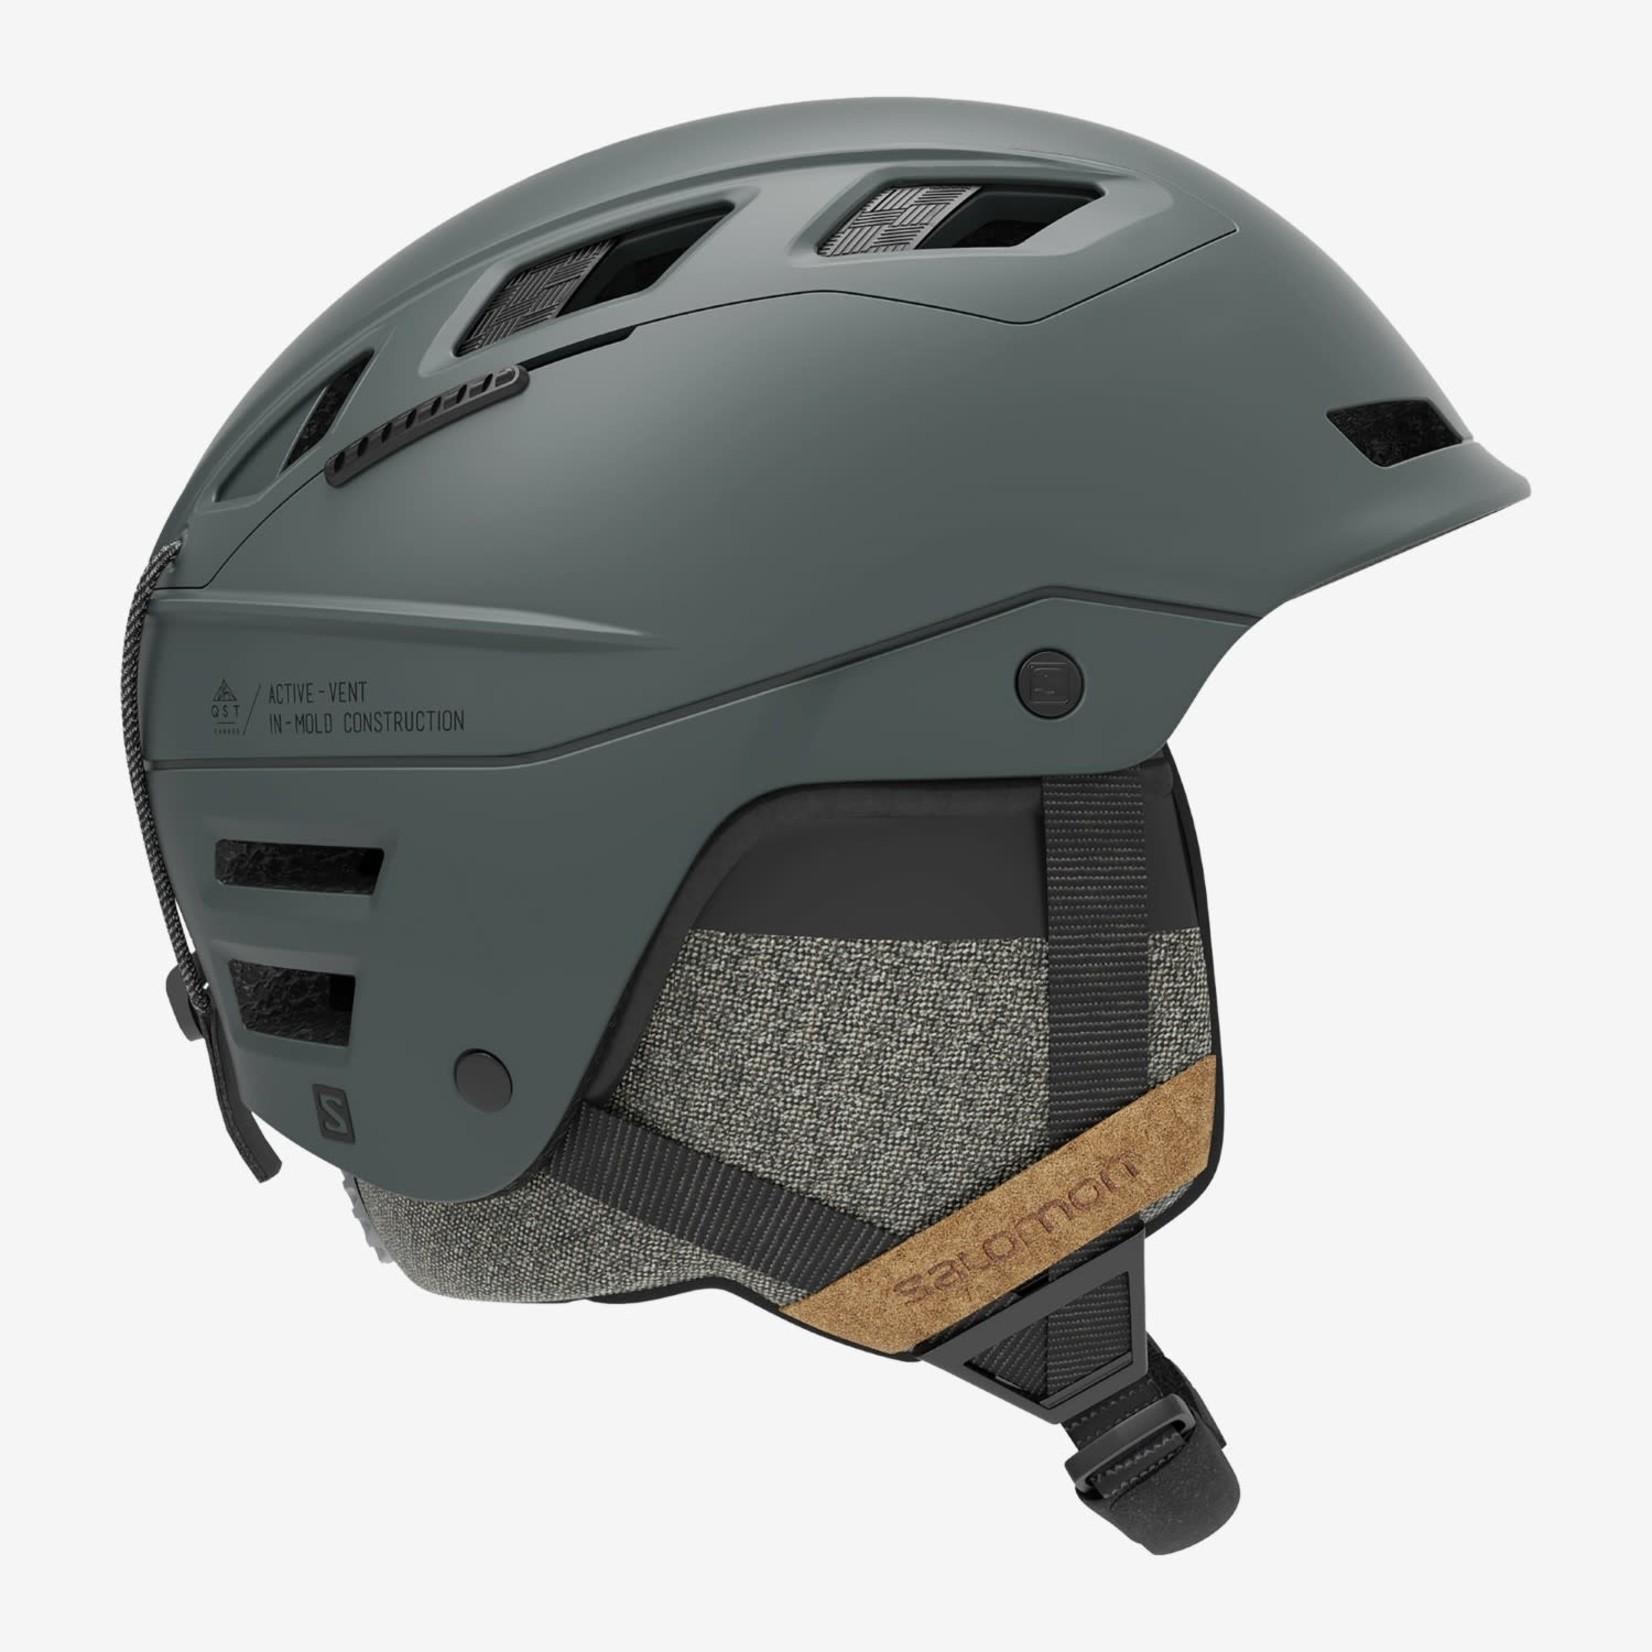 Salomon Salomon QST Charge Helmet - Men